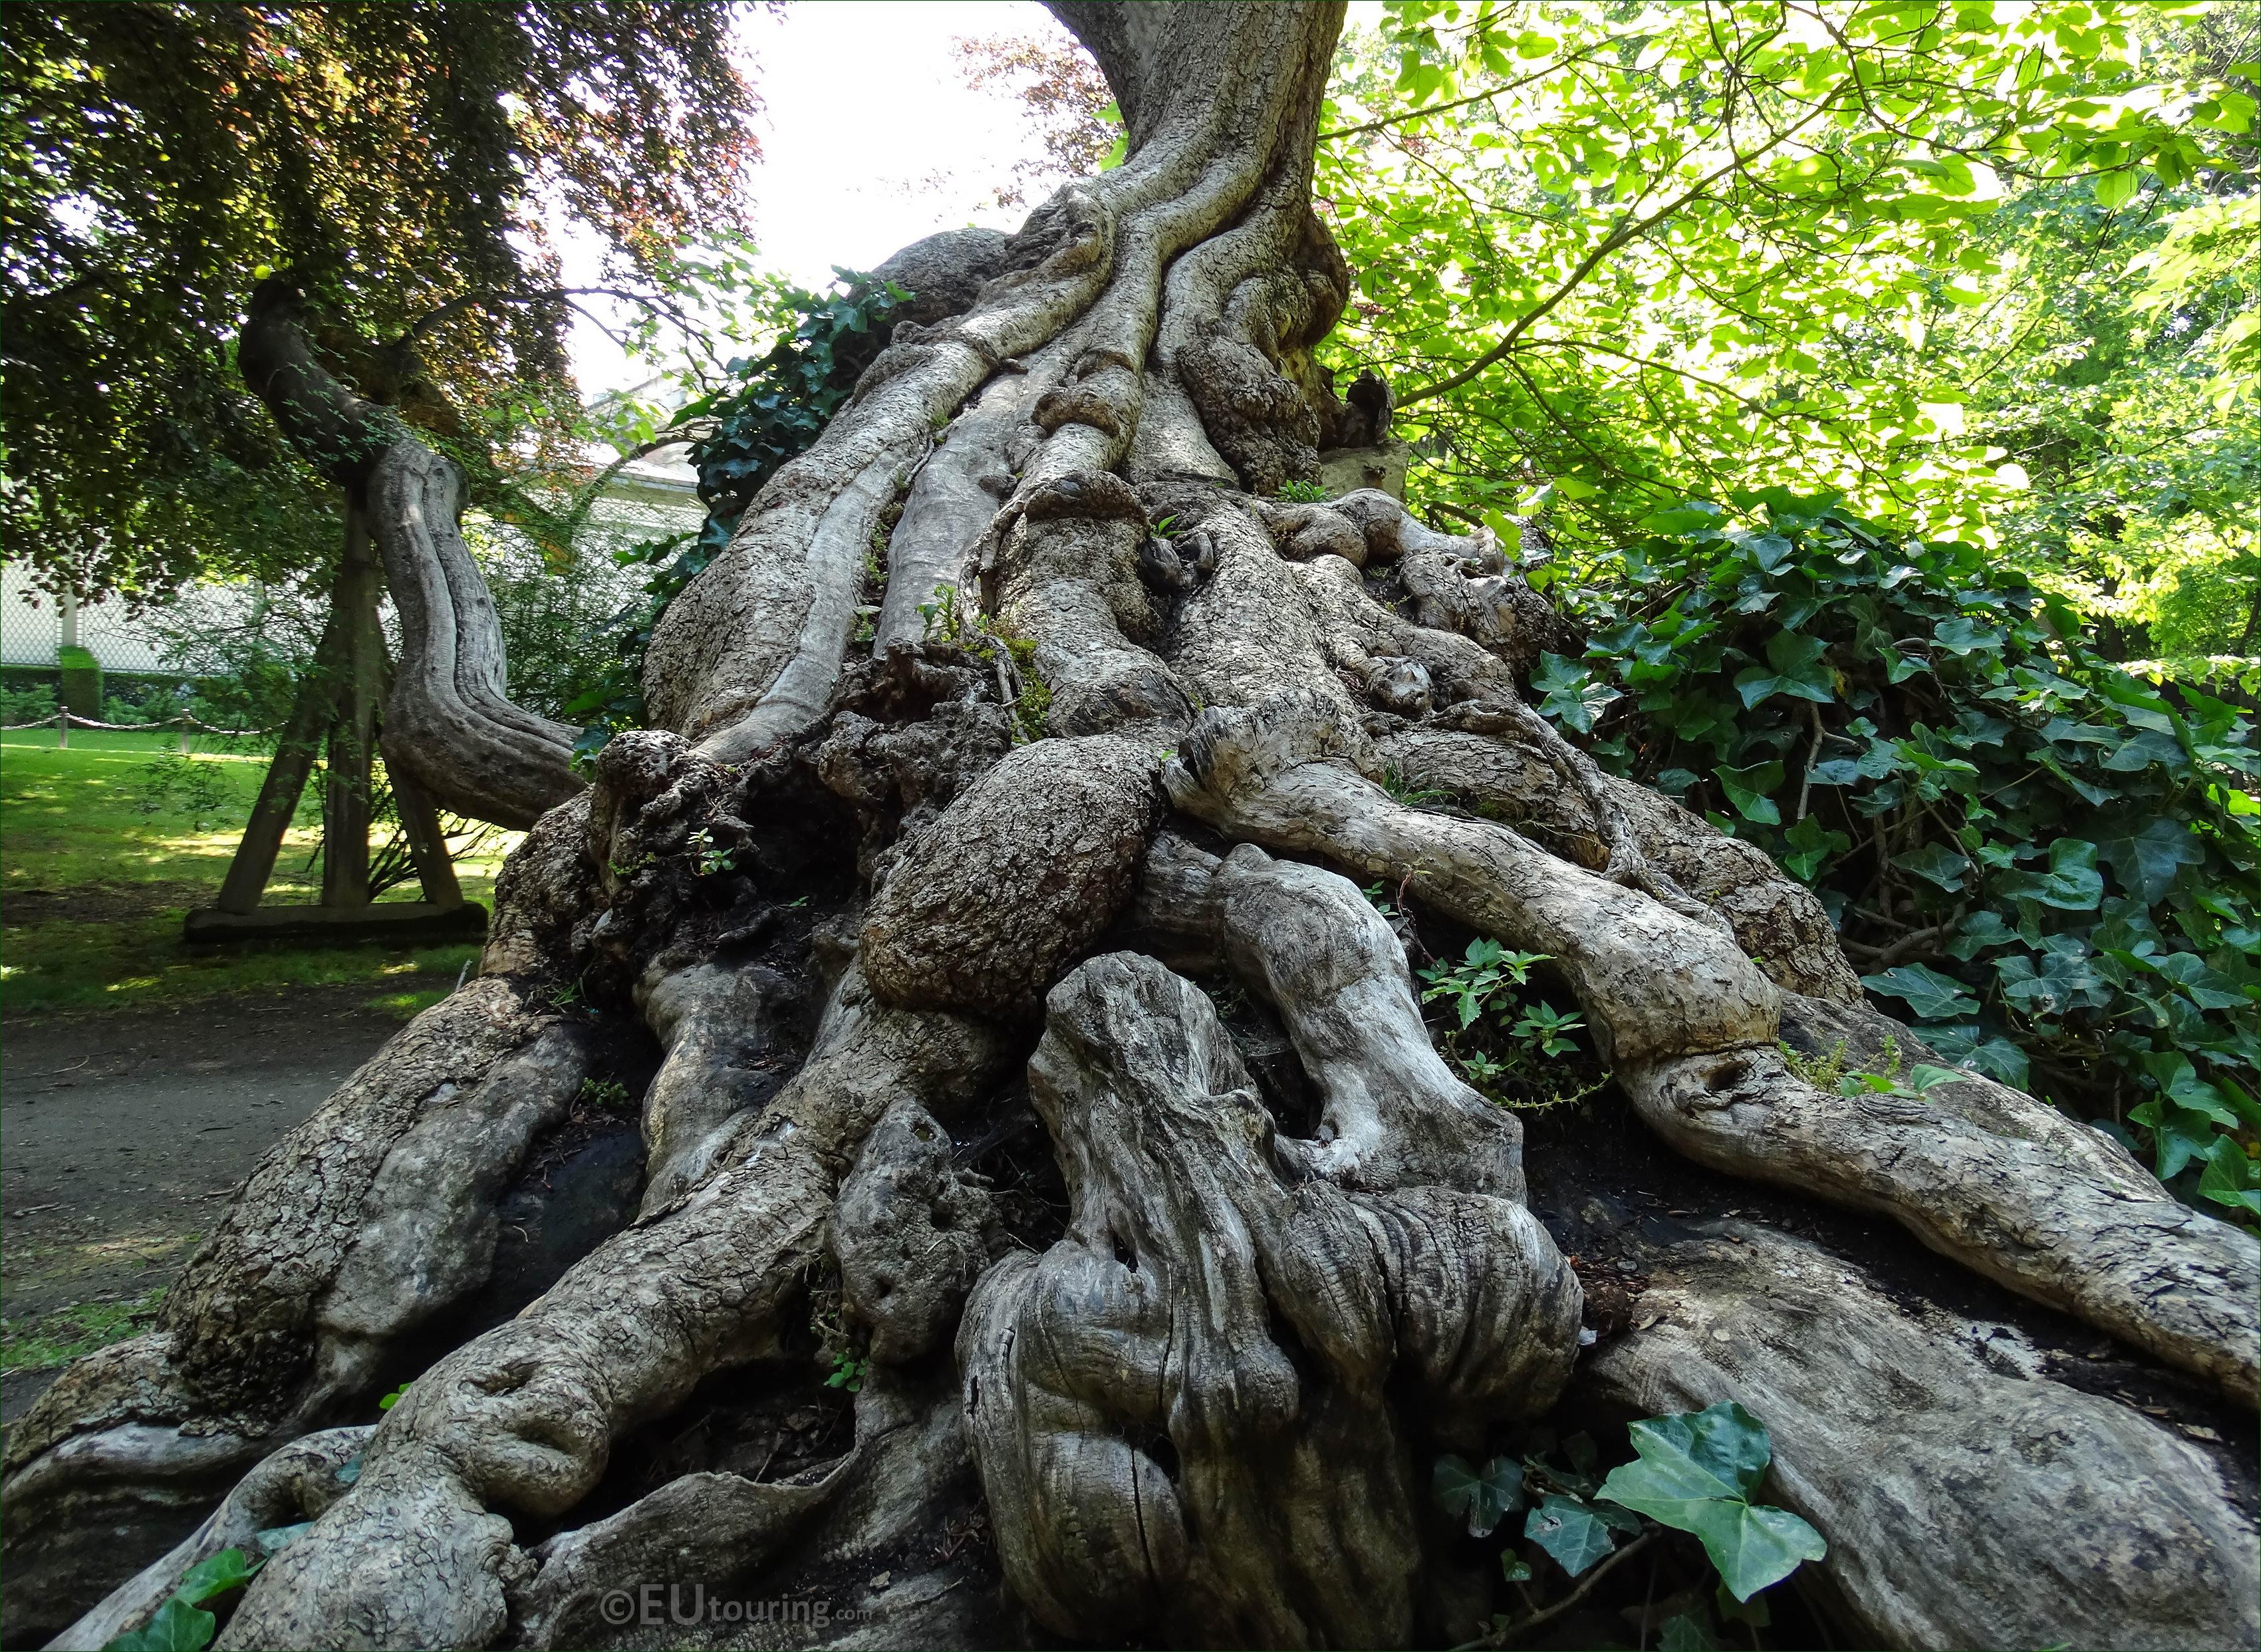 Photos of jardin du luxembourg public gardens in paris for Au jardin du luxembourg